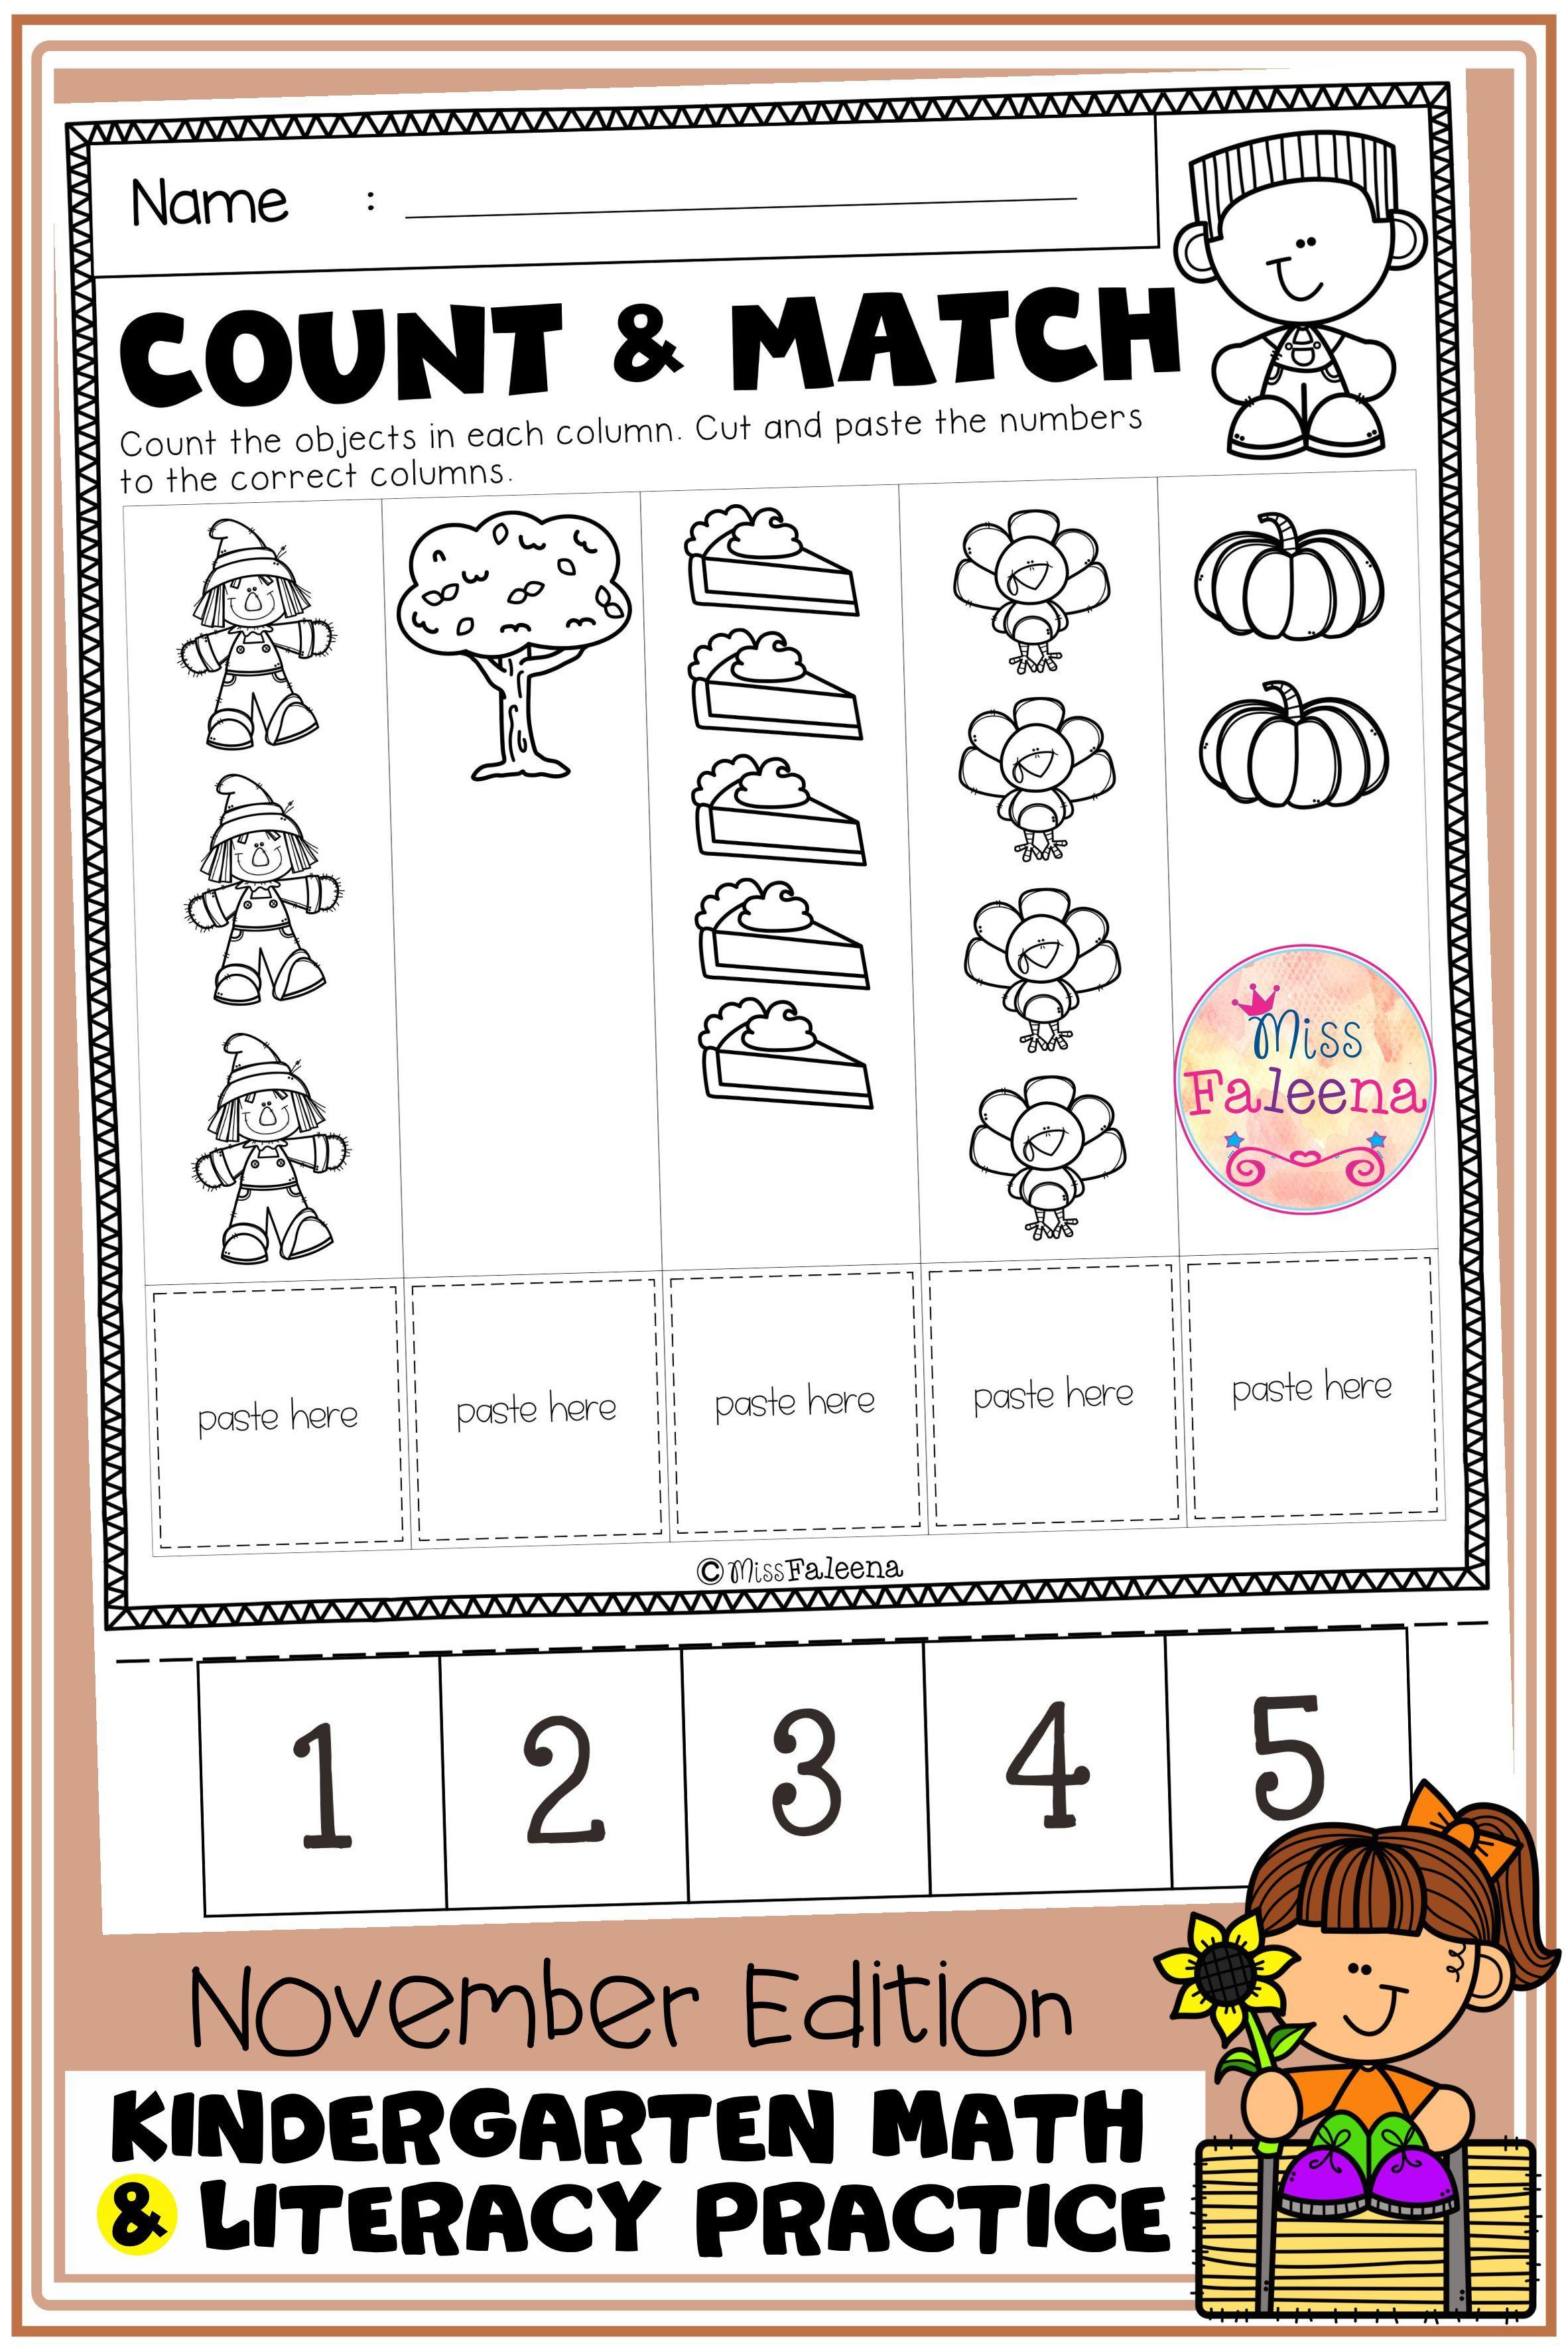 November Kindergarten Math And Literacy Practice Kindergarten Math Literacy Practice Elementary Math Lessons [ 3544 x 2364 Pixel ]